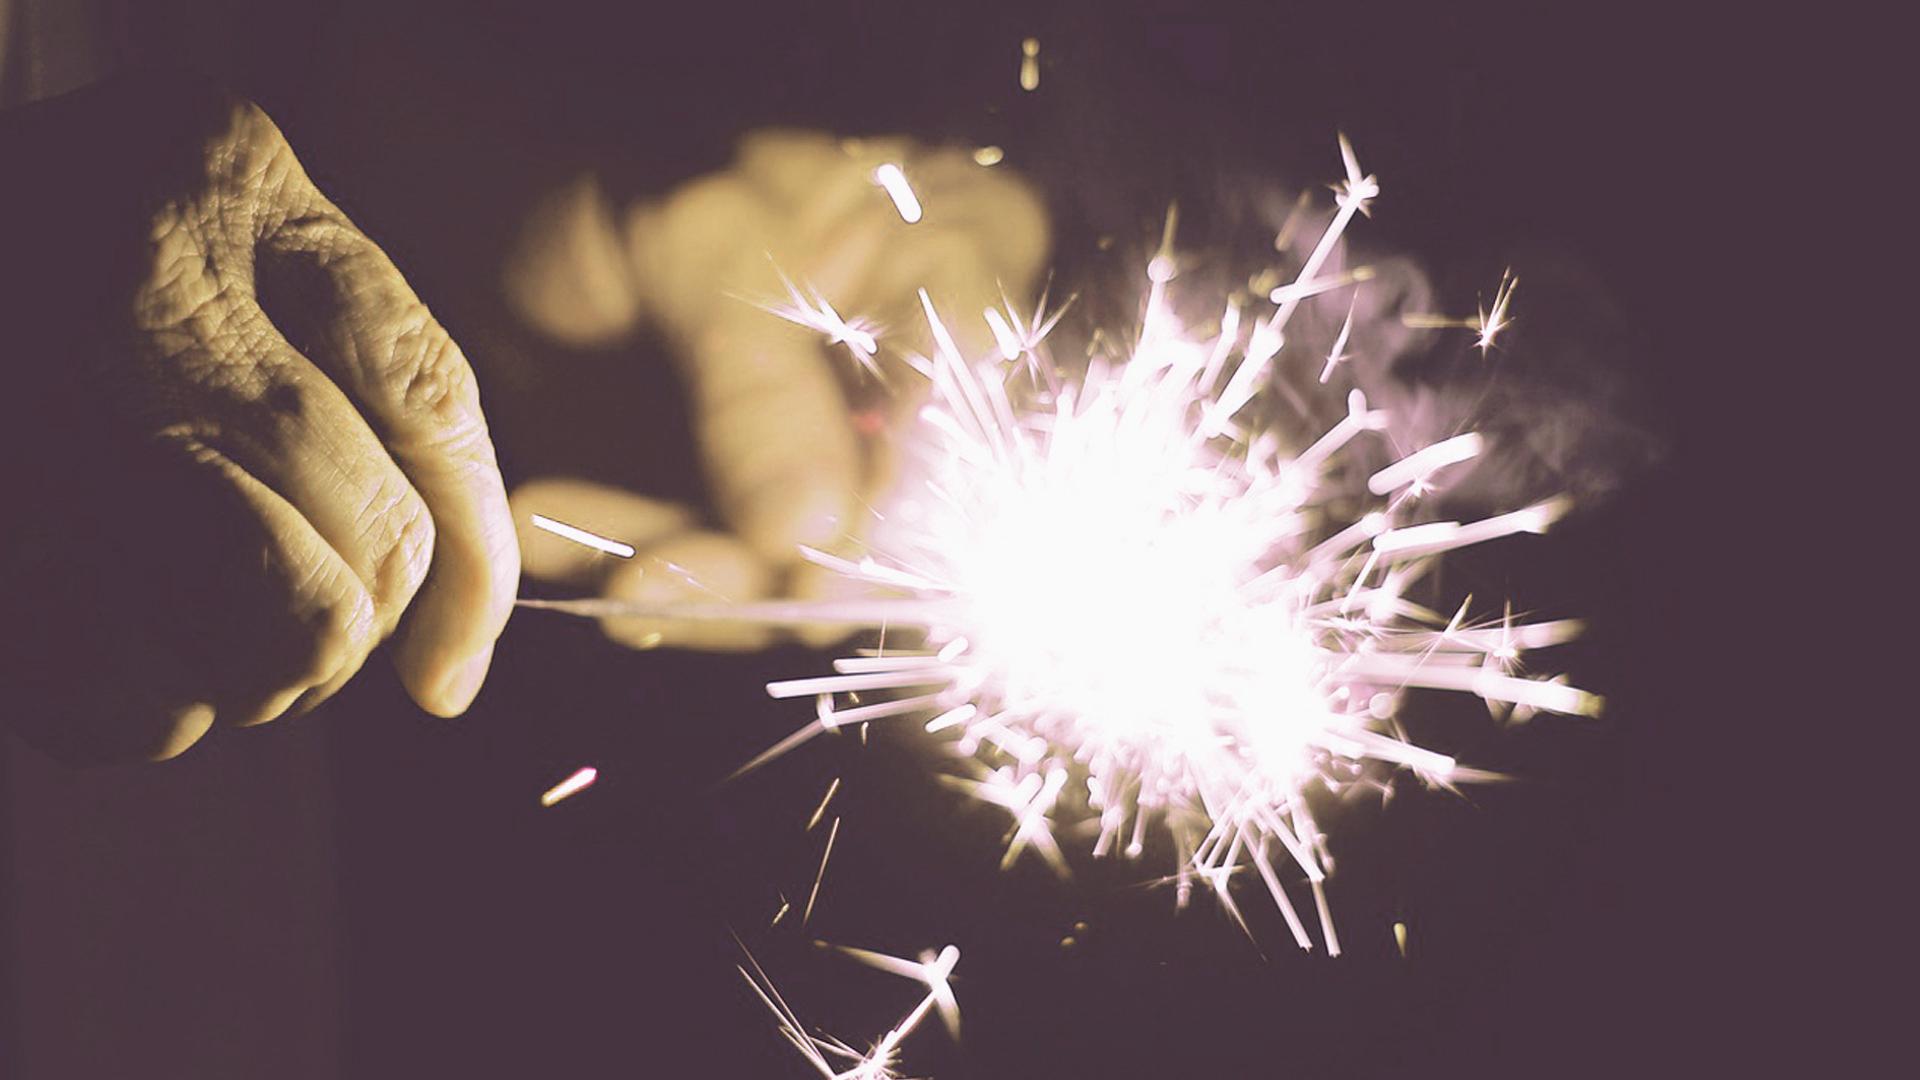 sparkler   Quiet Revolution's Top 10 of 2016